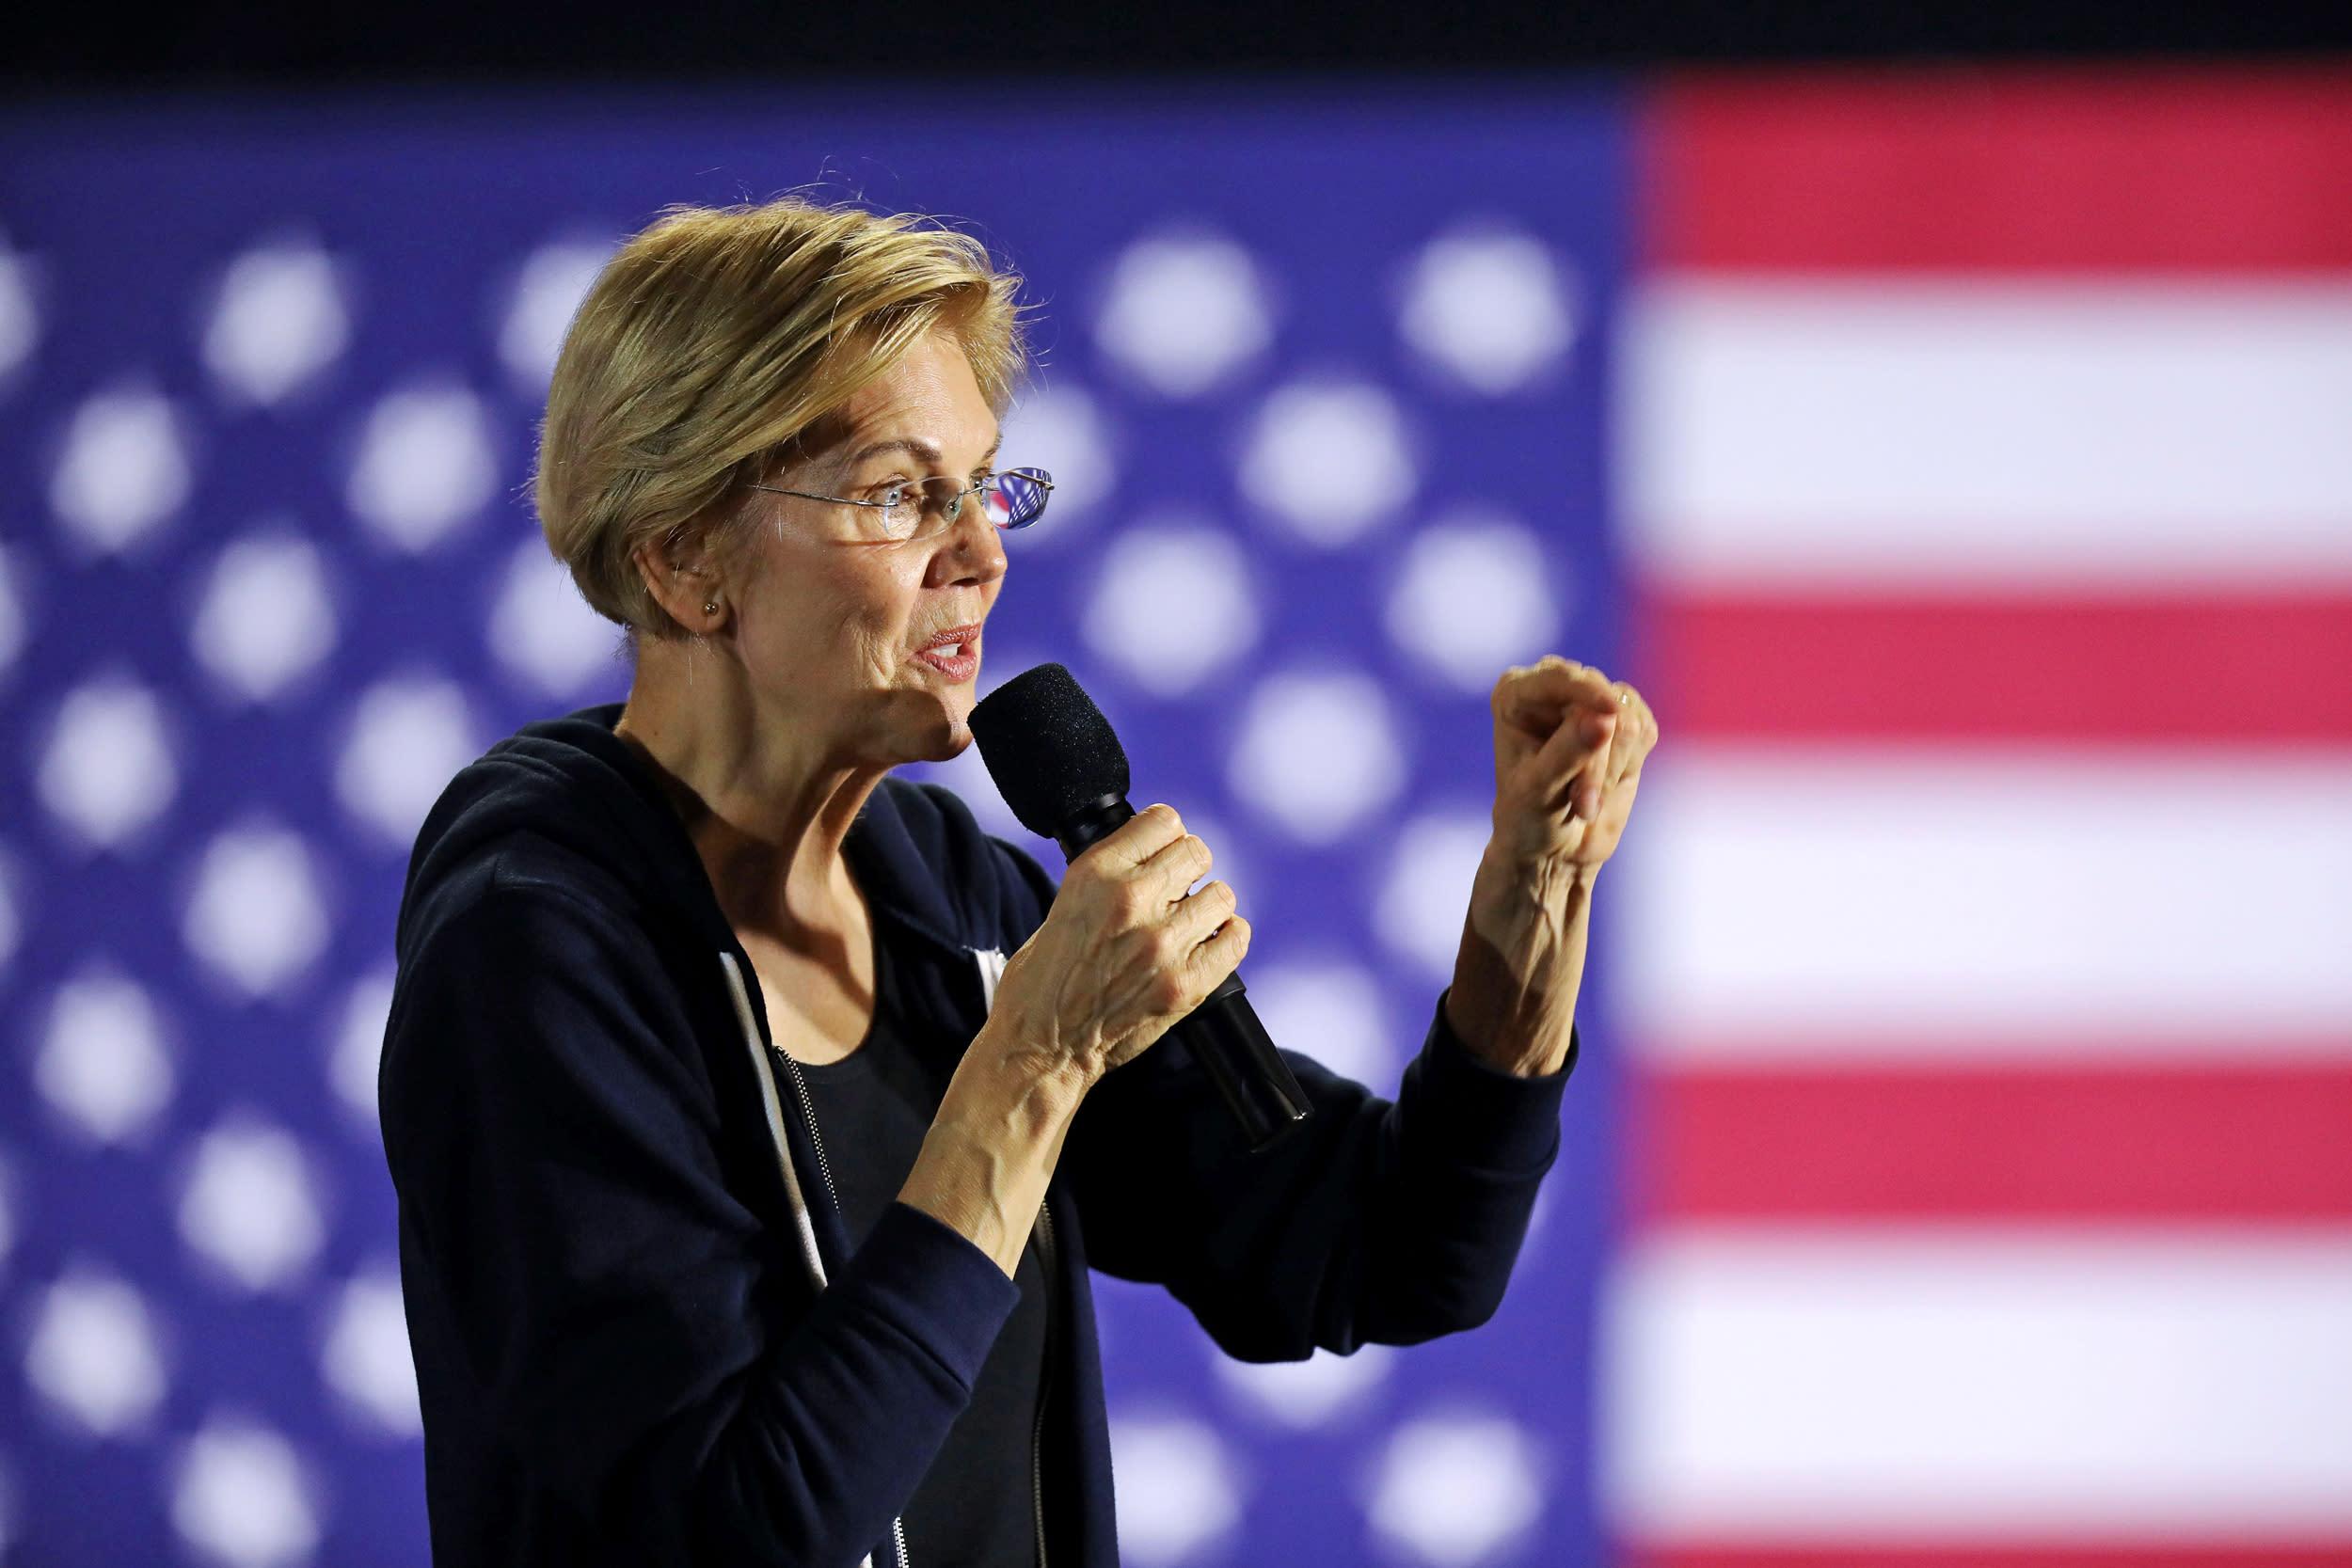 Elizabeth Warren announces plan to help low-income, diverse Asian American communities